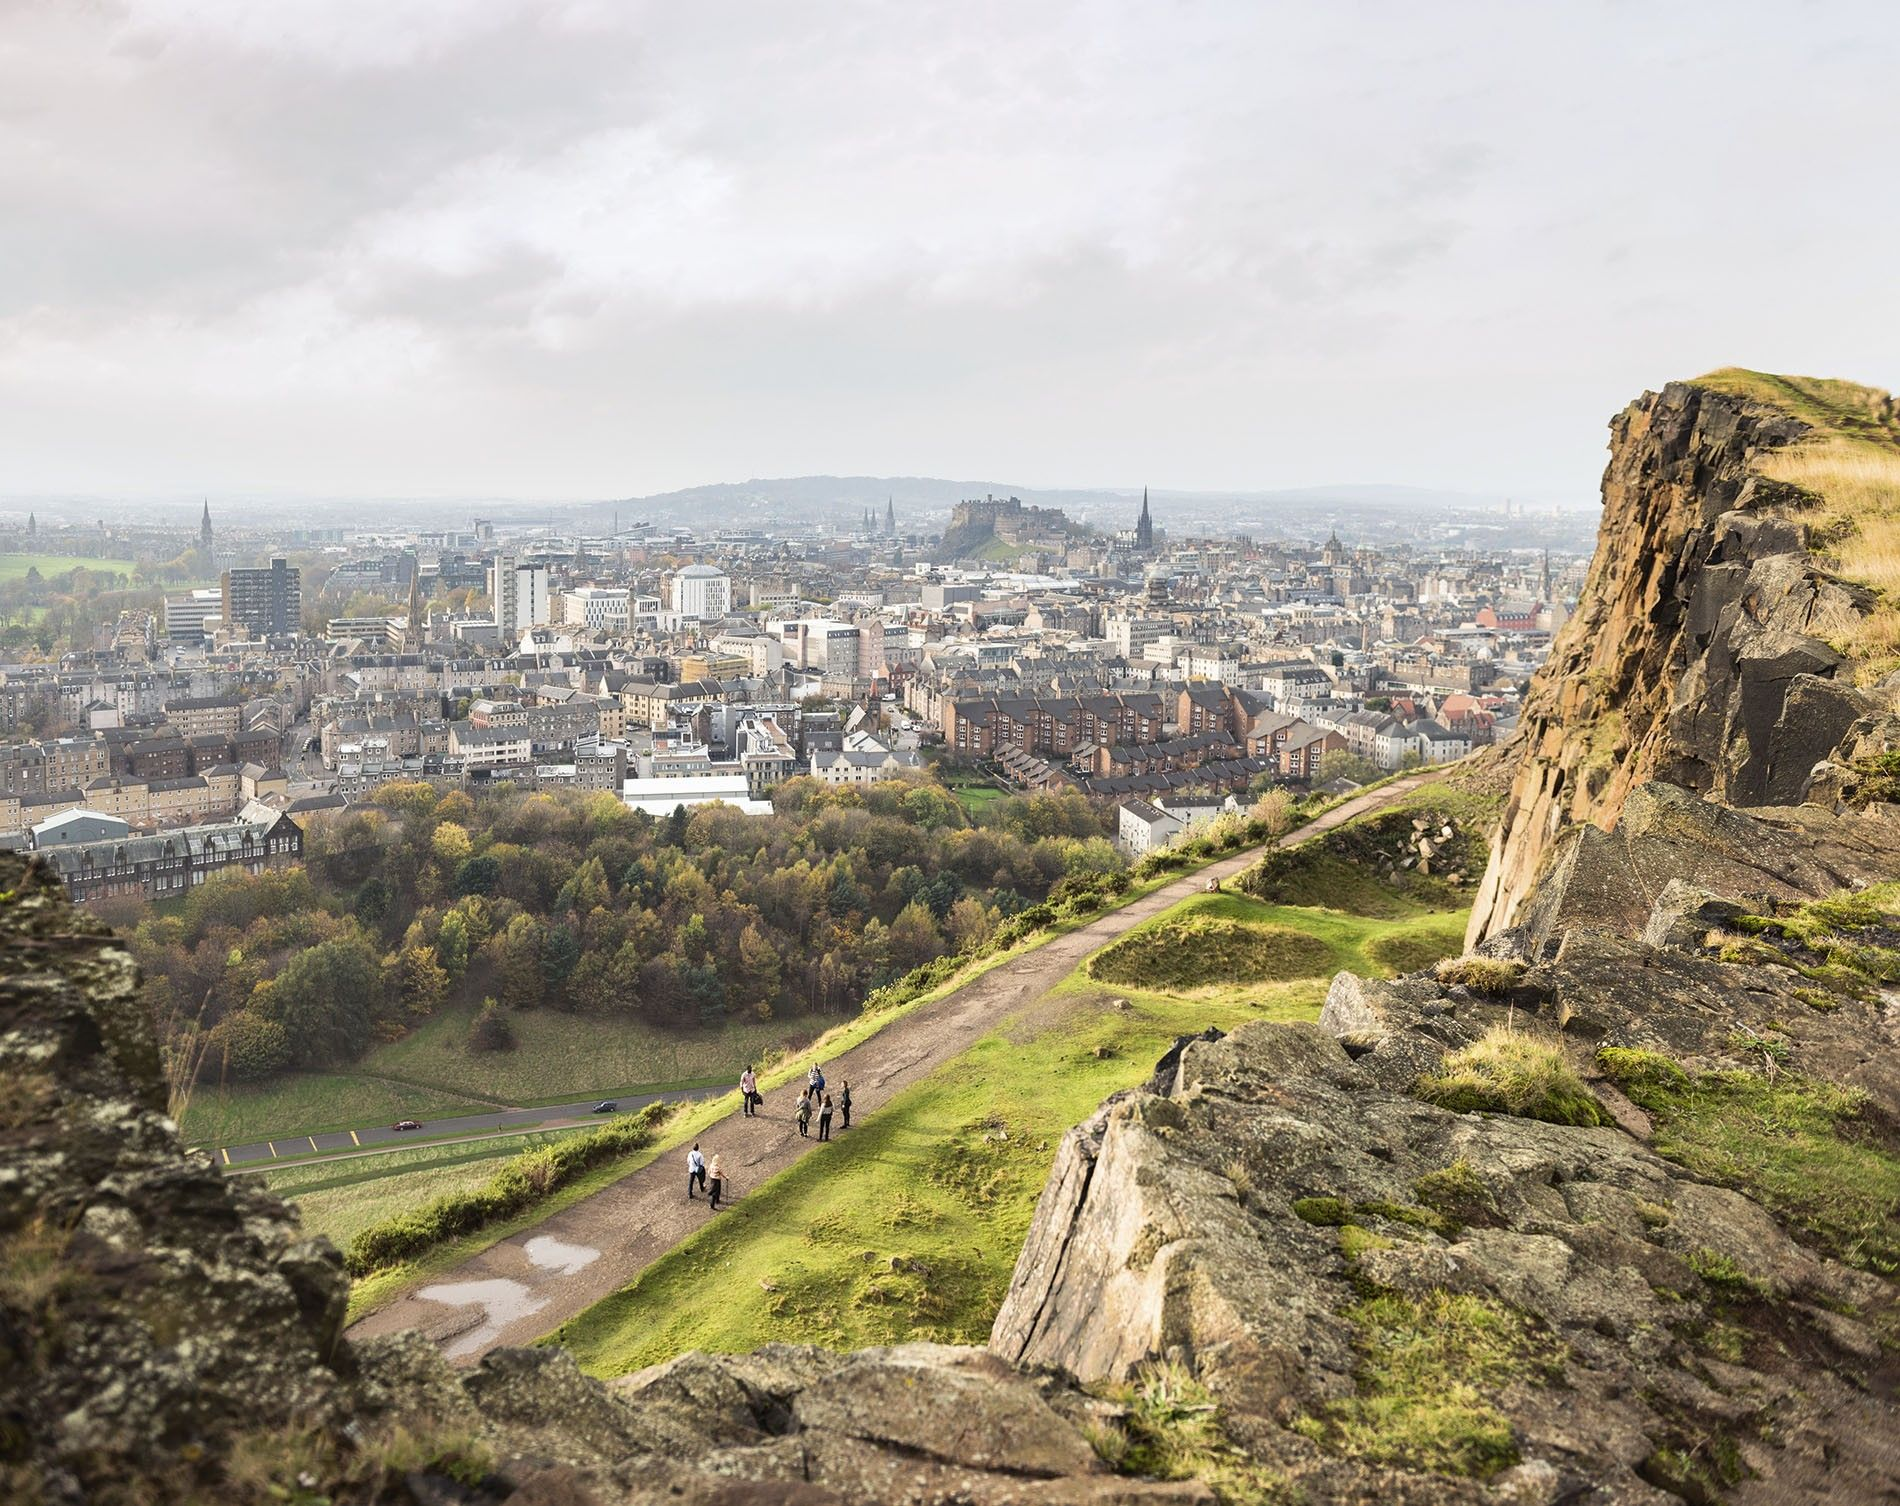 View of Edinburgh from Salisbury Crags.